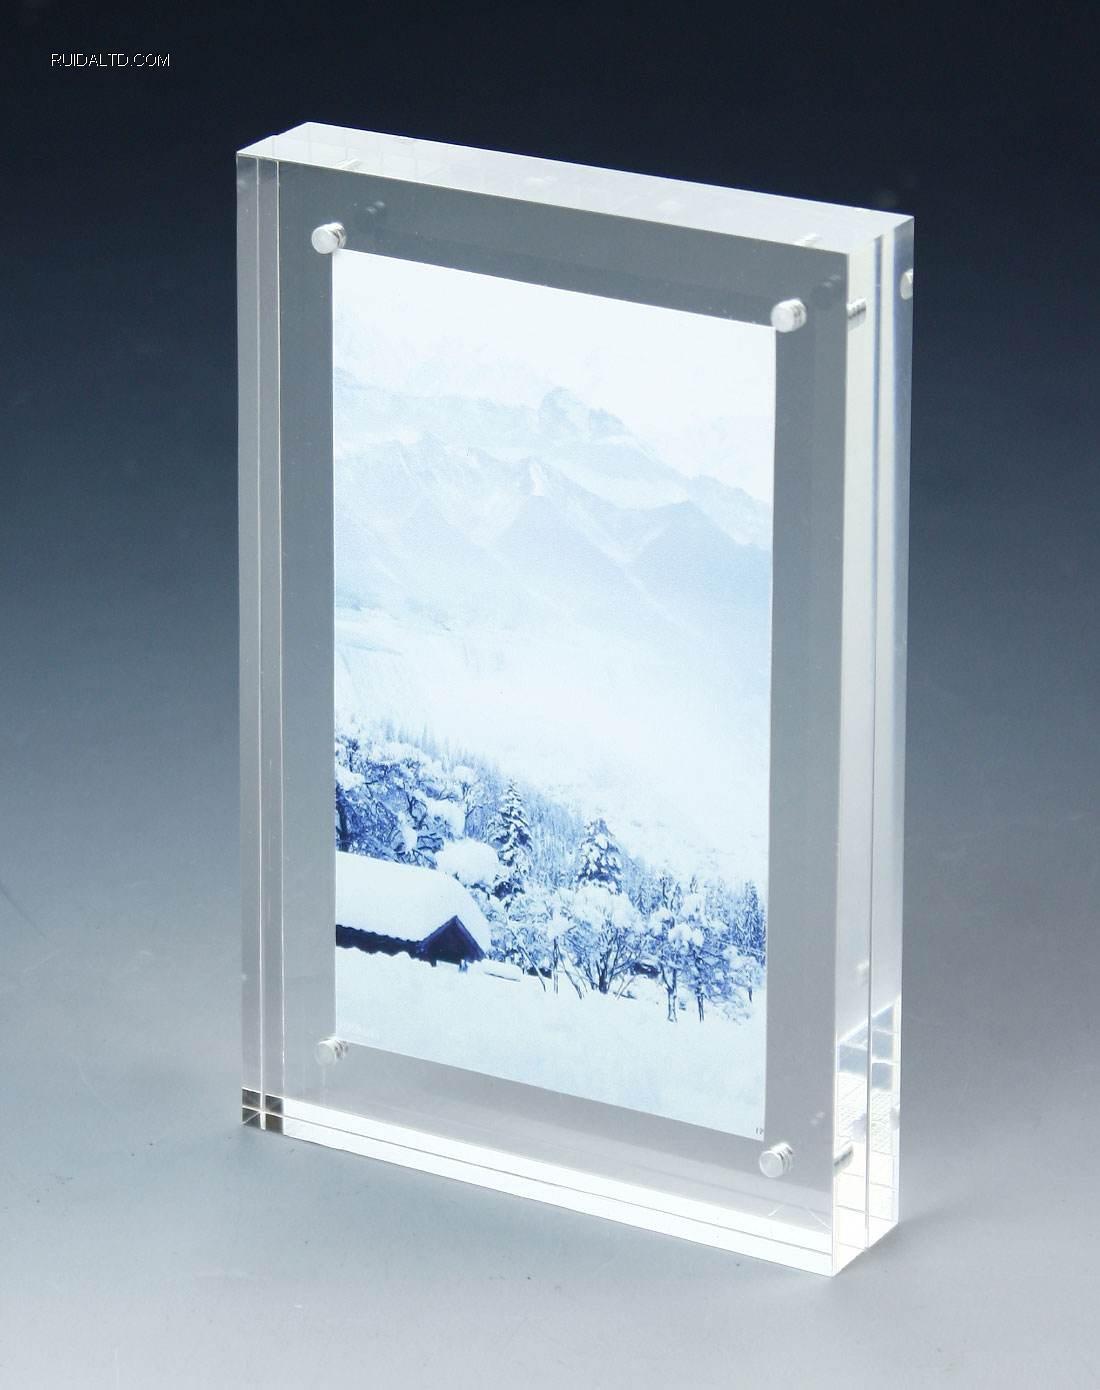 5*7 inch custom magnetic acrylic photo frames